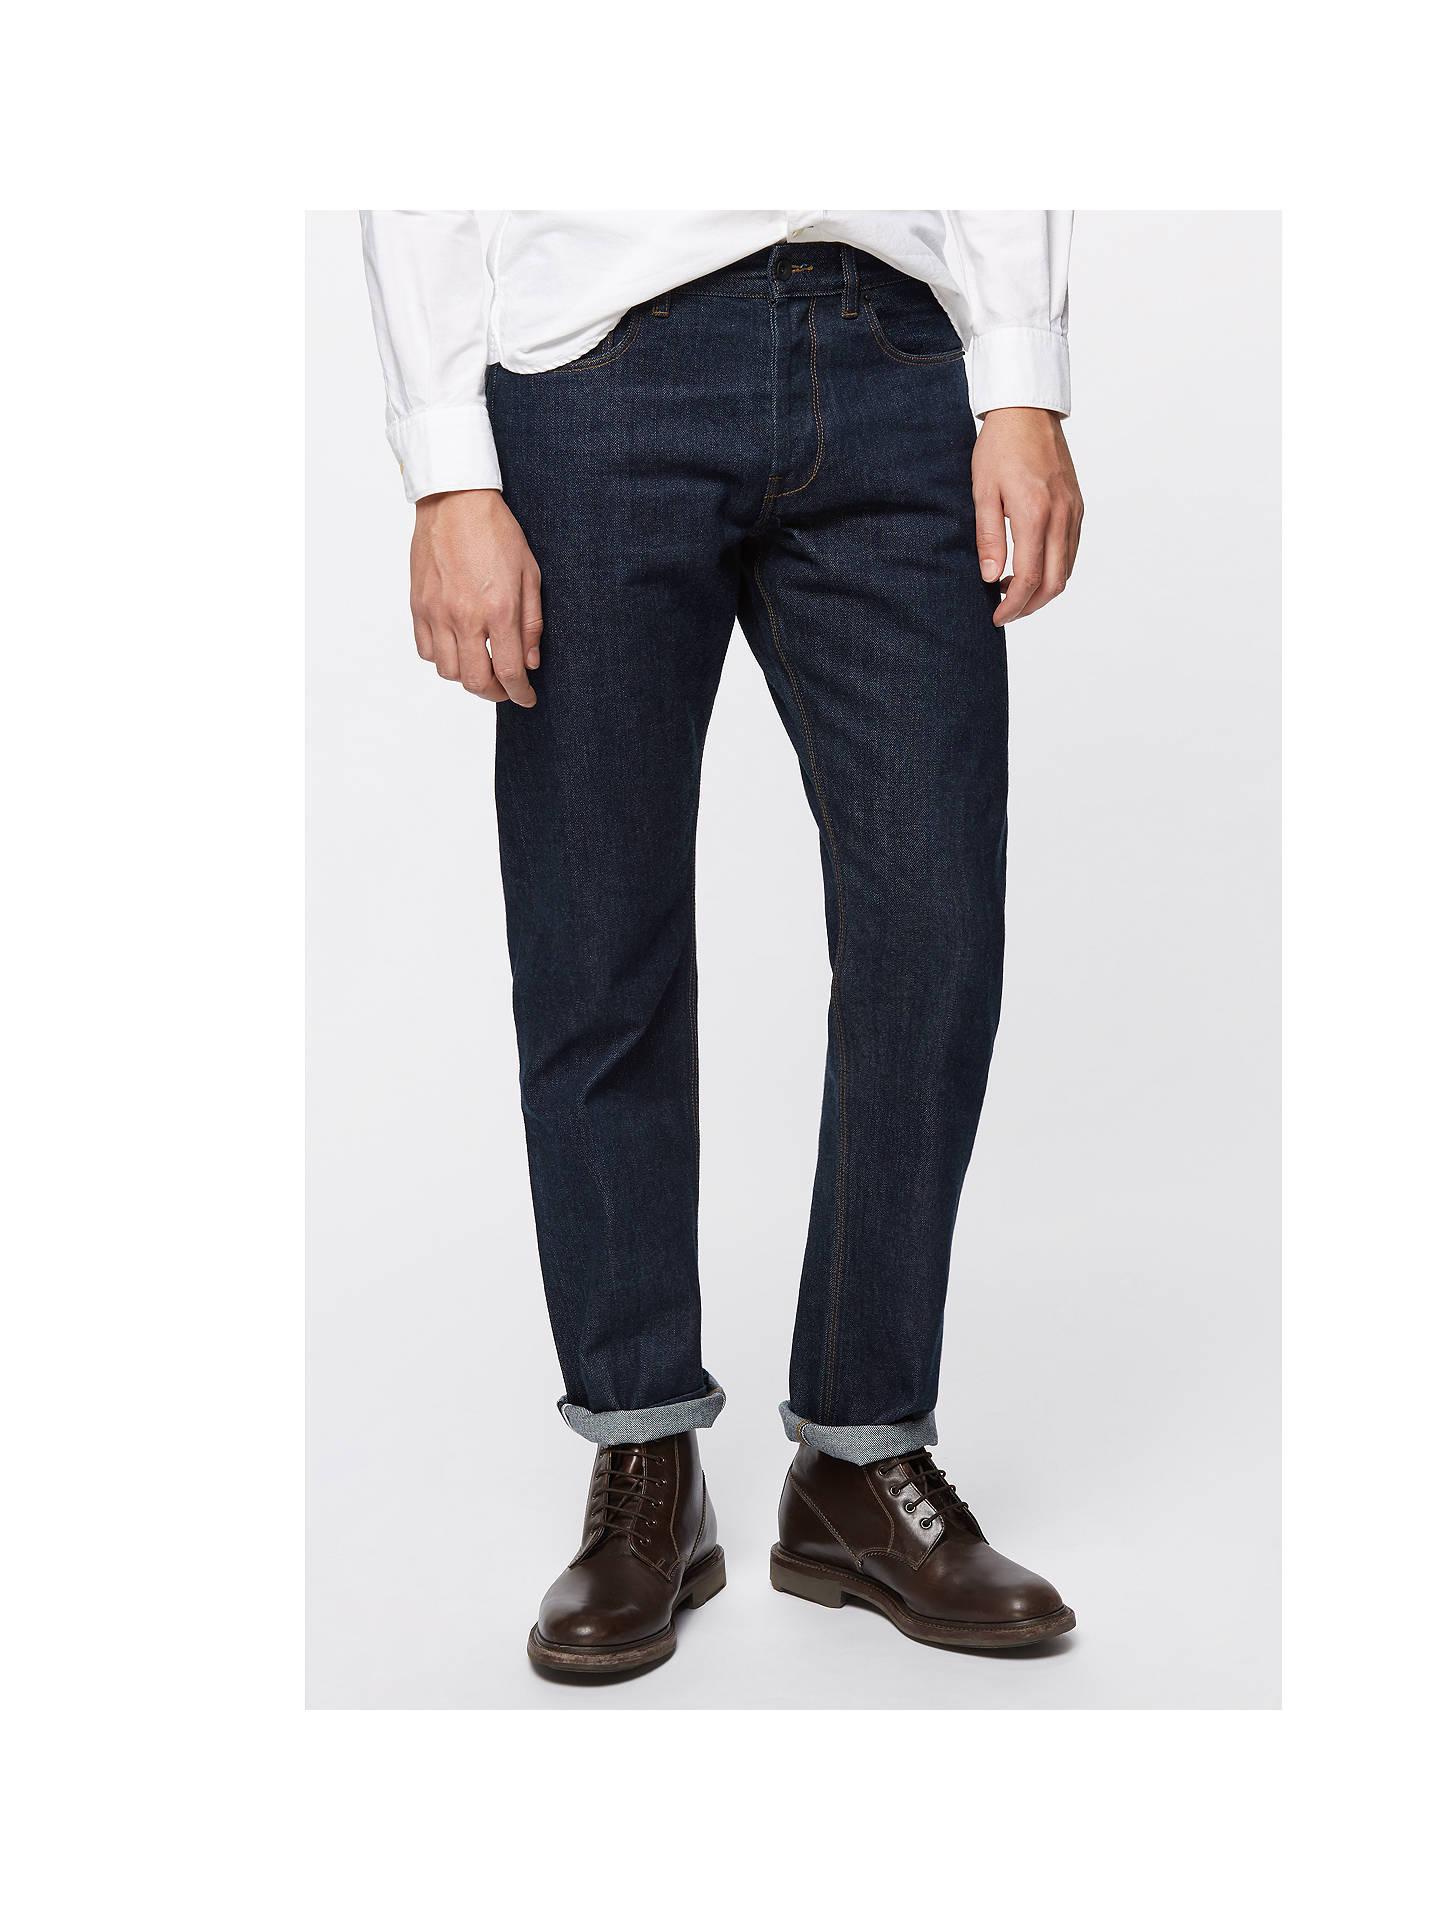 32d3933a0e2bee Buy Jigsaw Japanese Selvedge Denim Straight Jeans